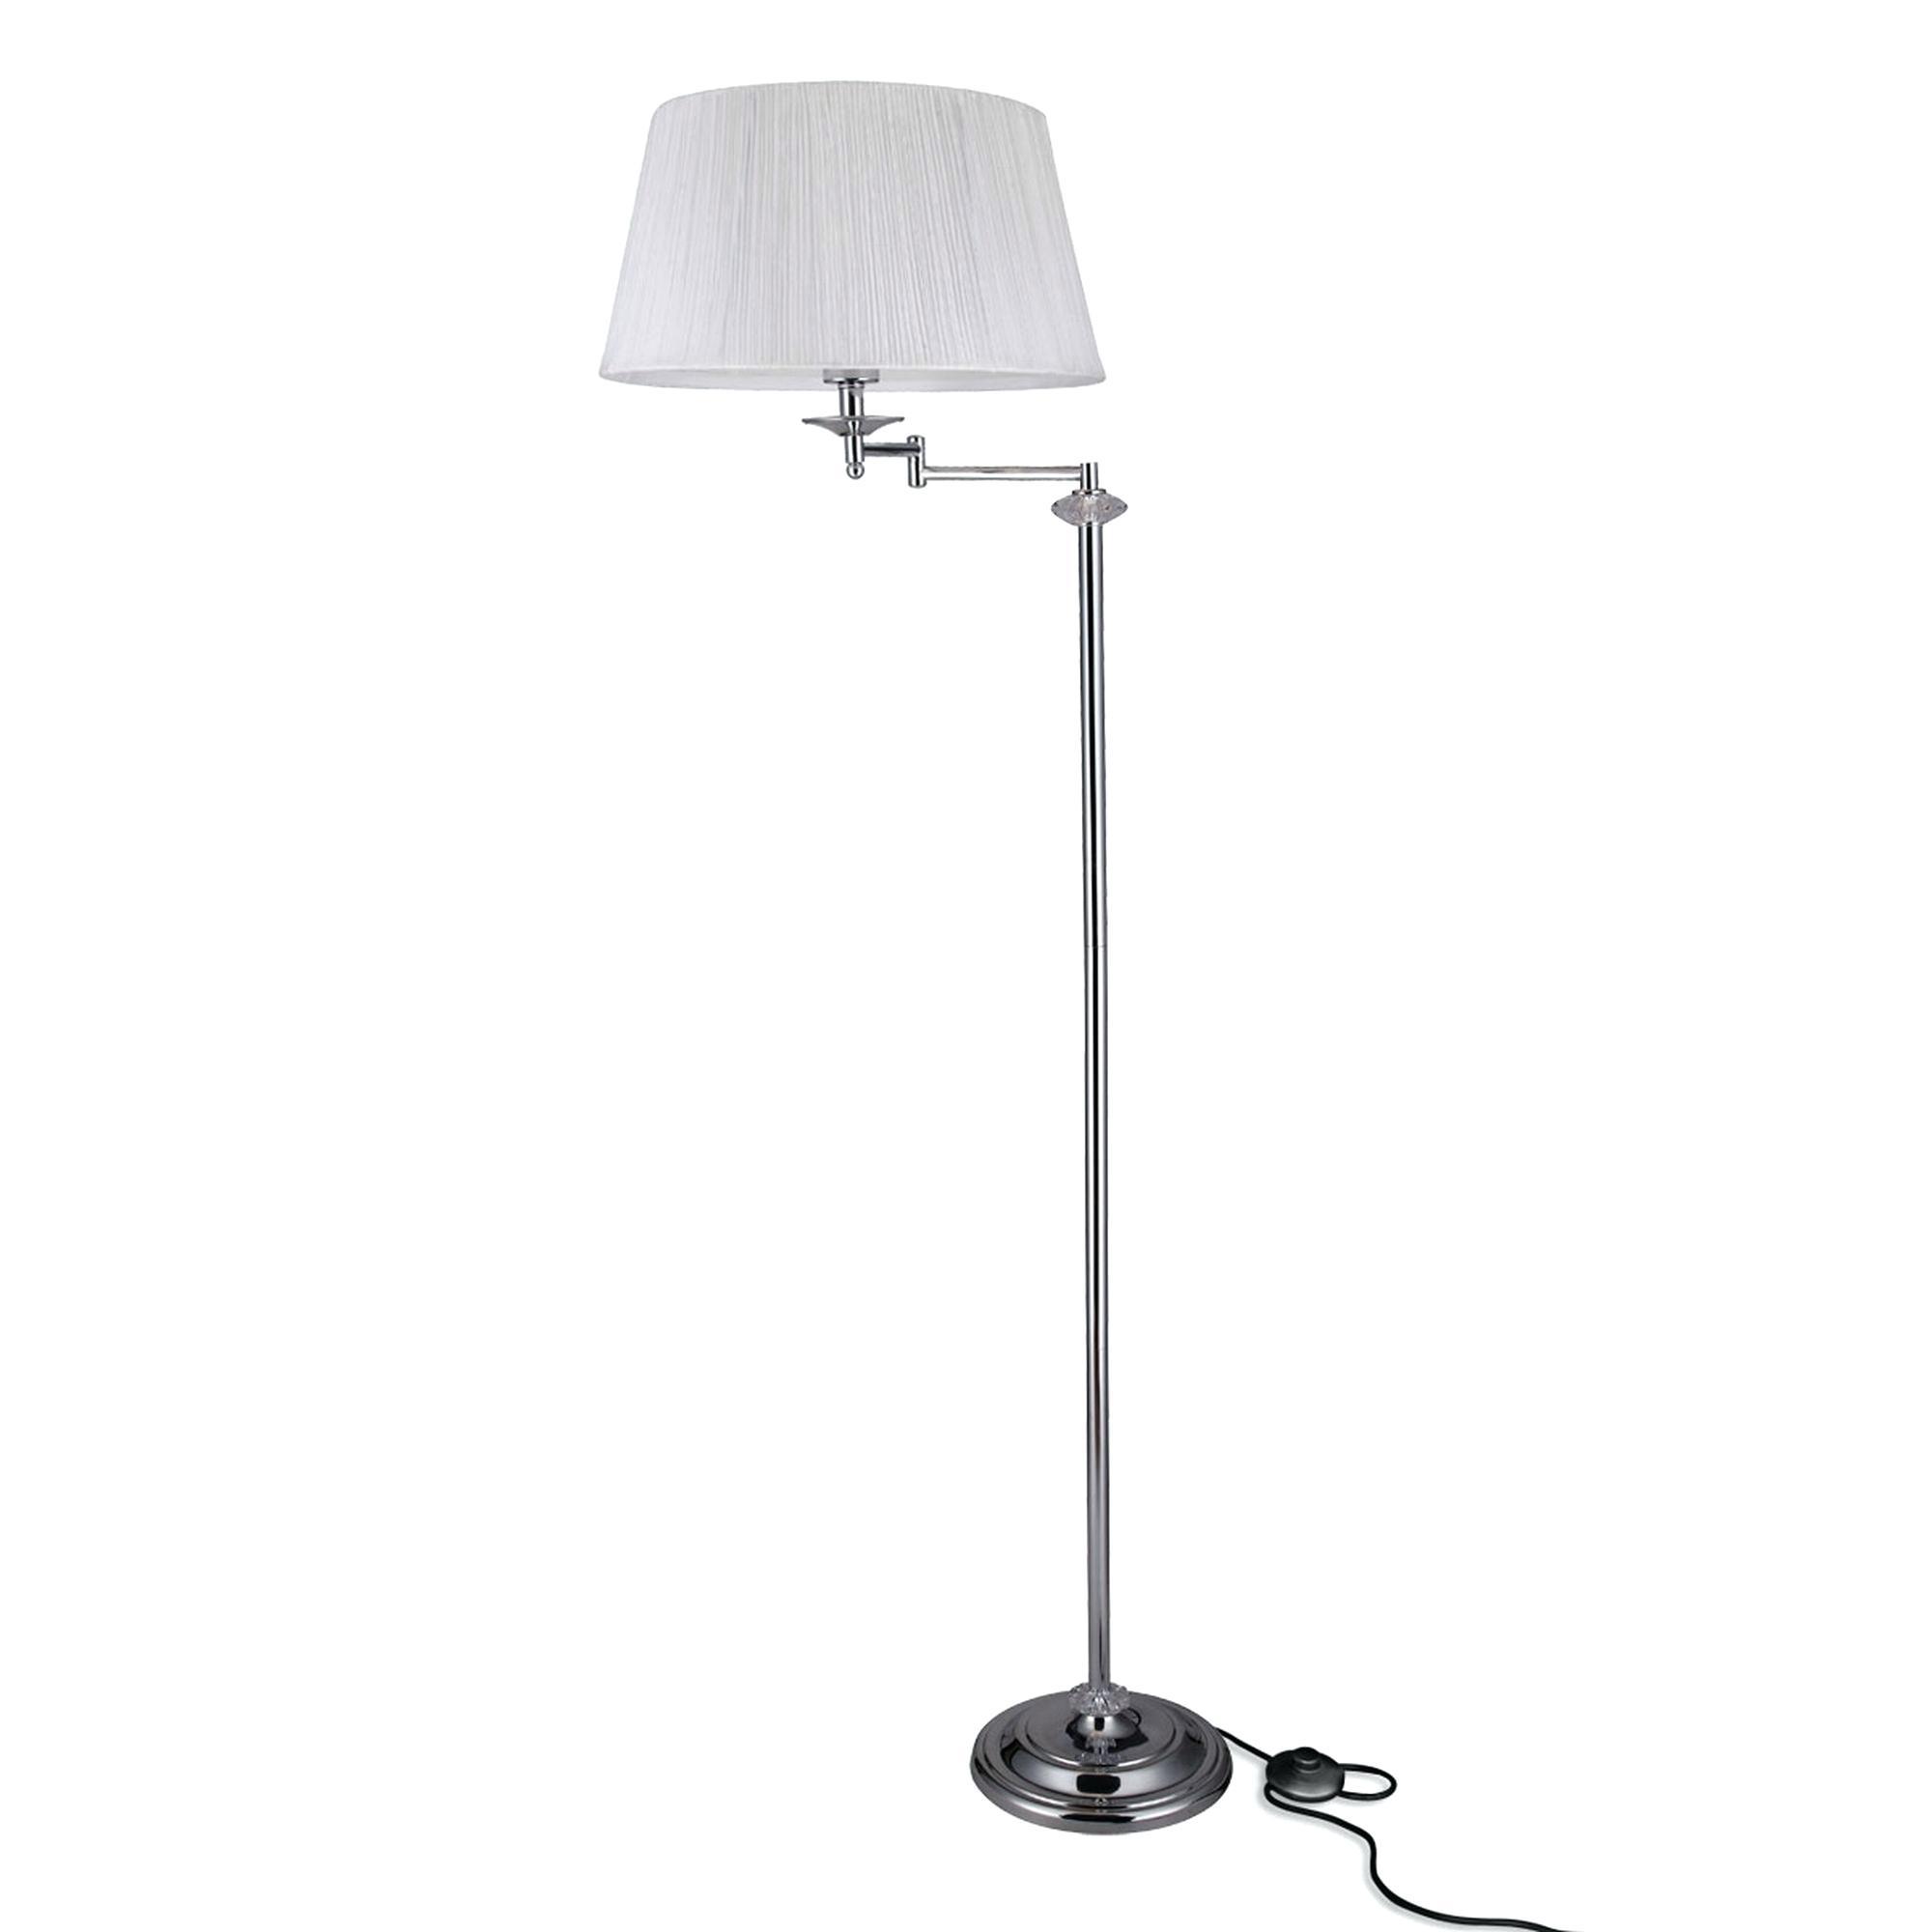 Full Size of Wohnzimmer Stehlampe Led Dimmbar Stehleuchte Stehlampen Stehleuchten Deckenleuchten Deckenlampen Sessel Hängeschrank Fototapeten Beleuchtung Küche Wohnzimmer Wohnzimmer Stehlampe Led